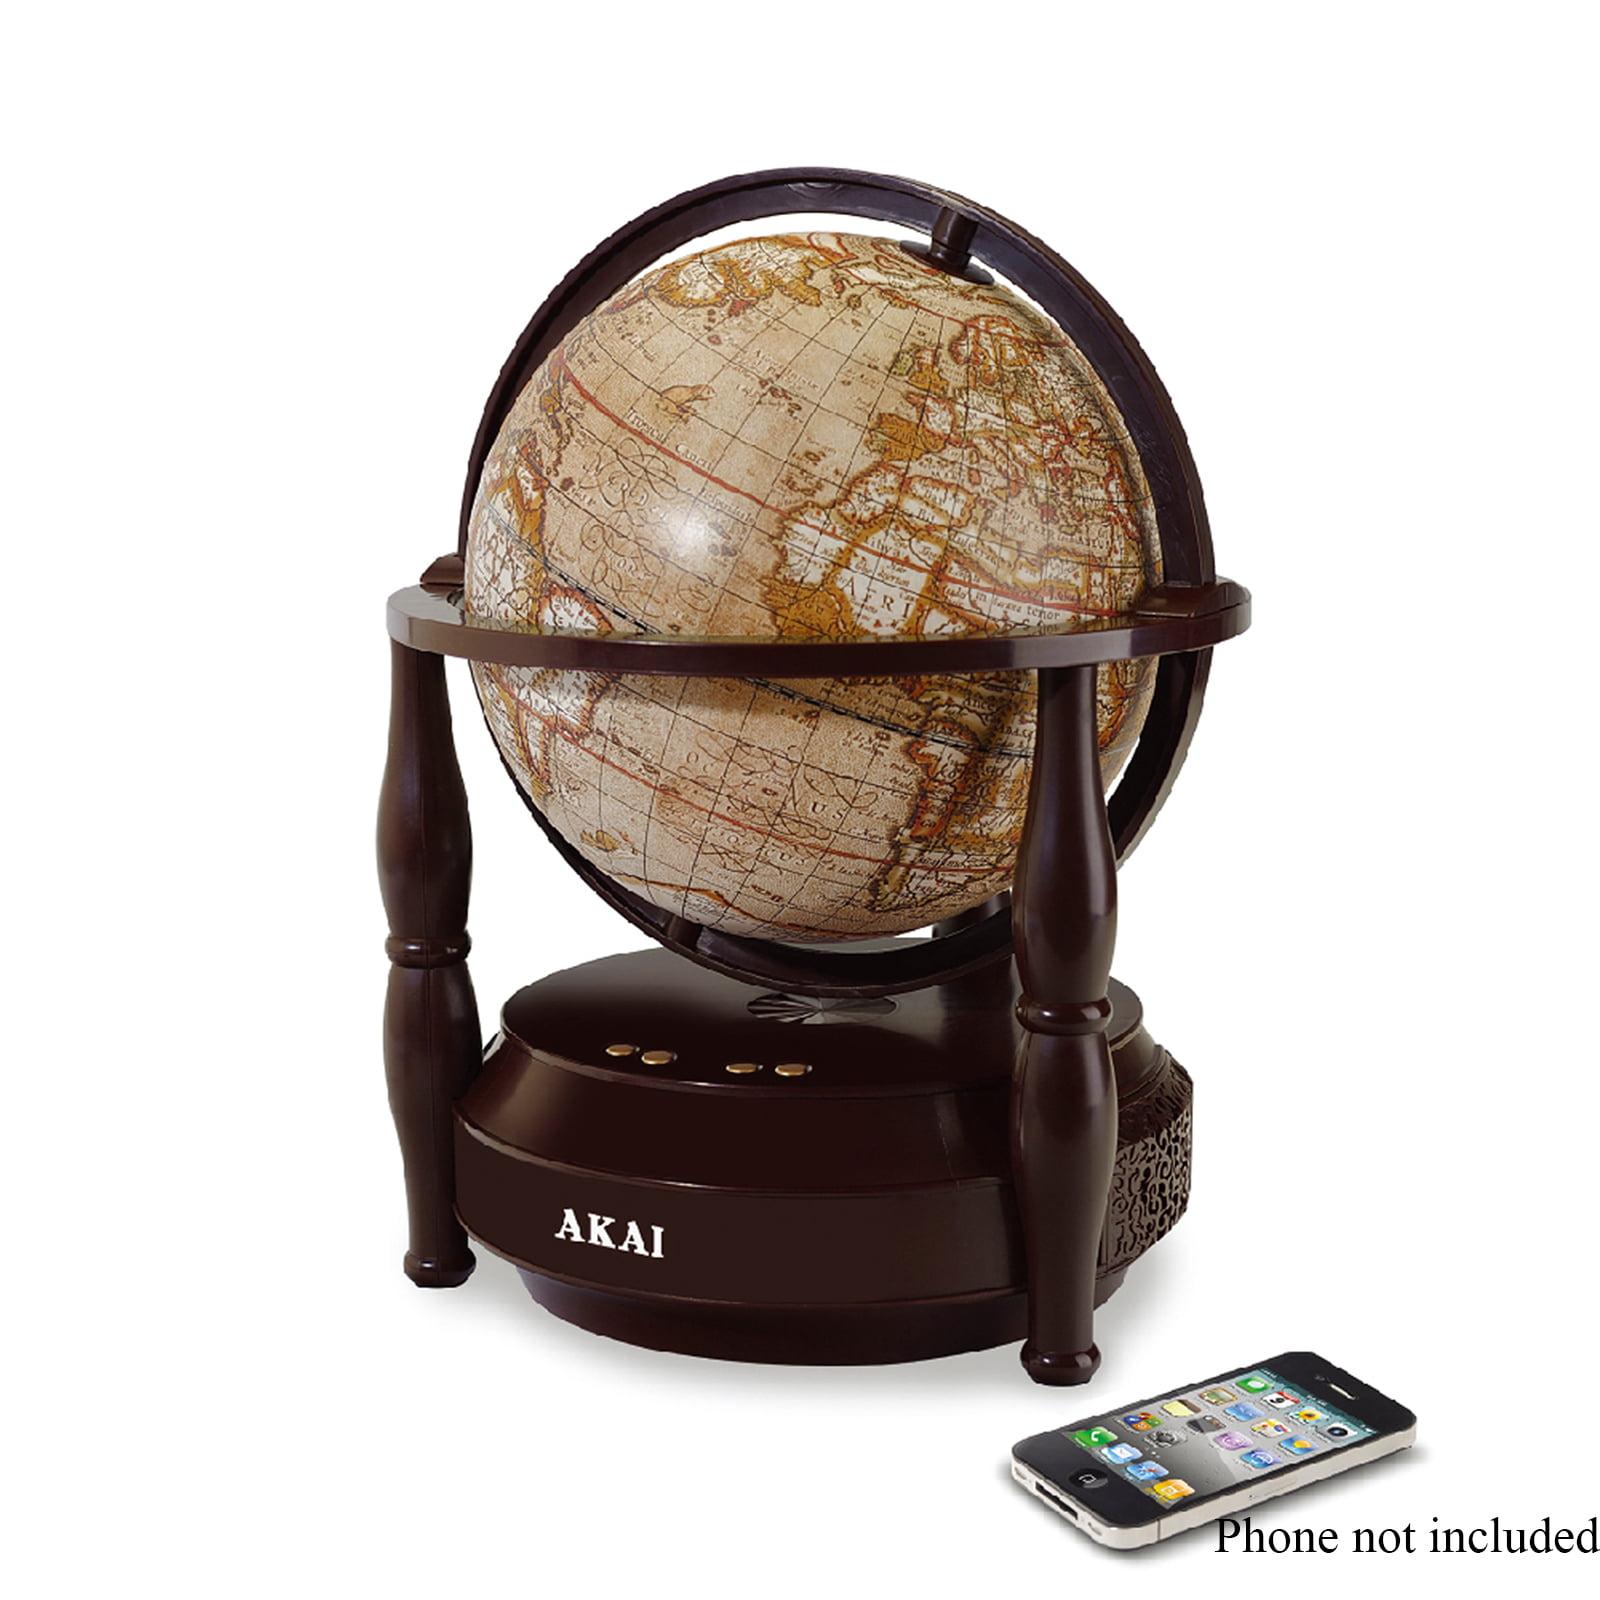 Image of Akai Bluetooth Speaker with Rotating Globe